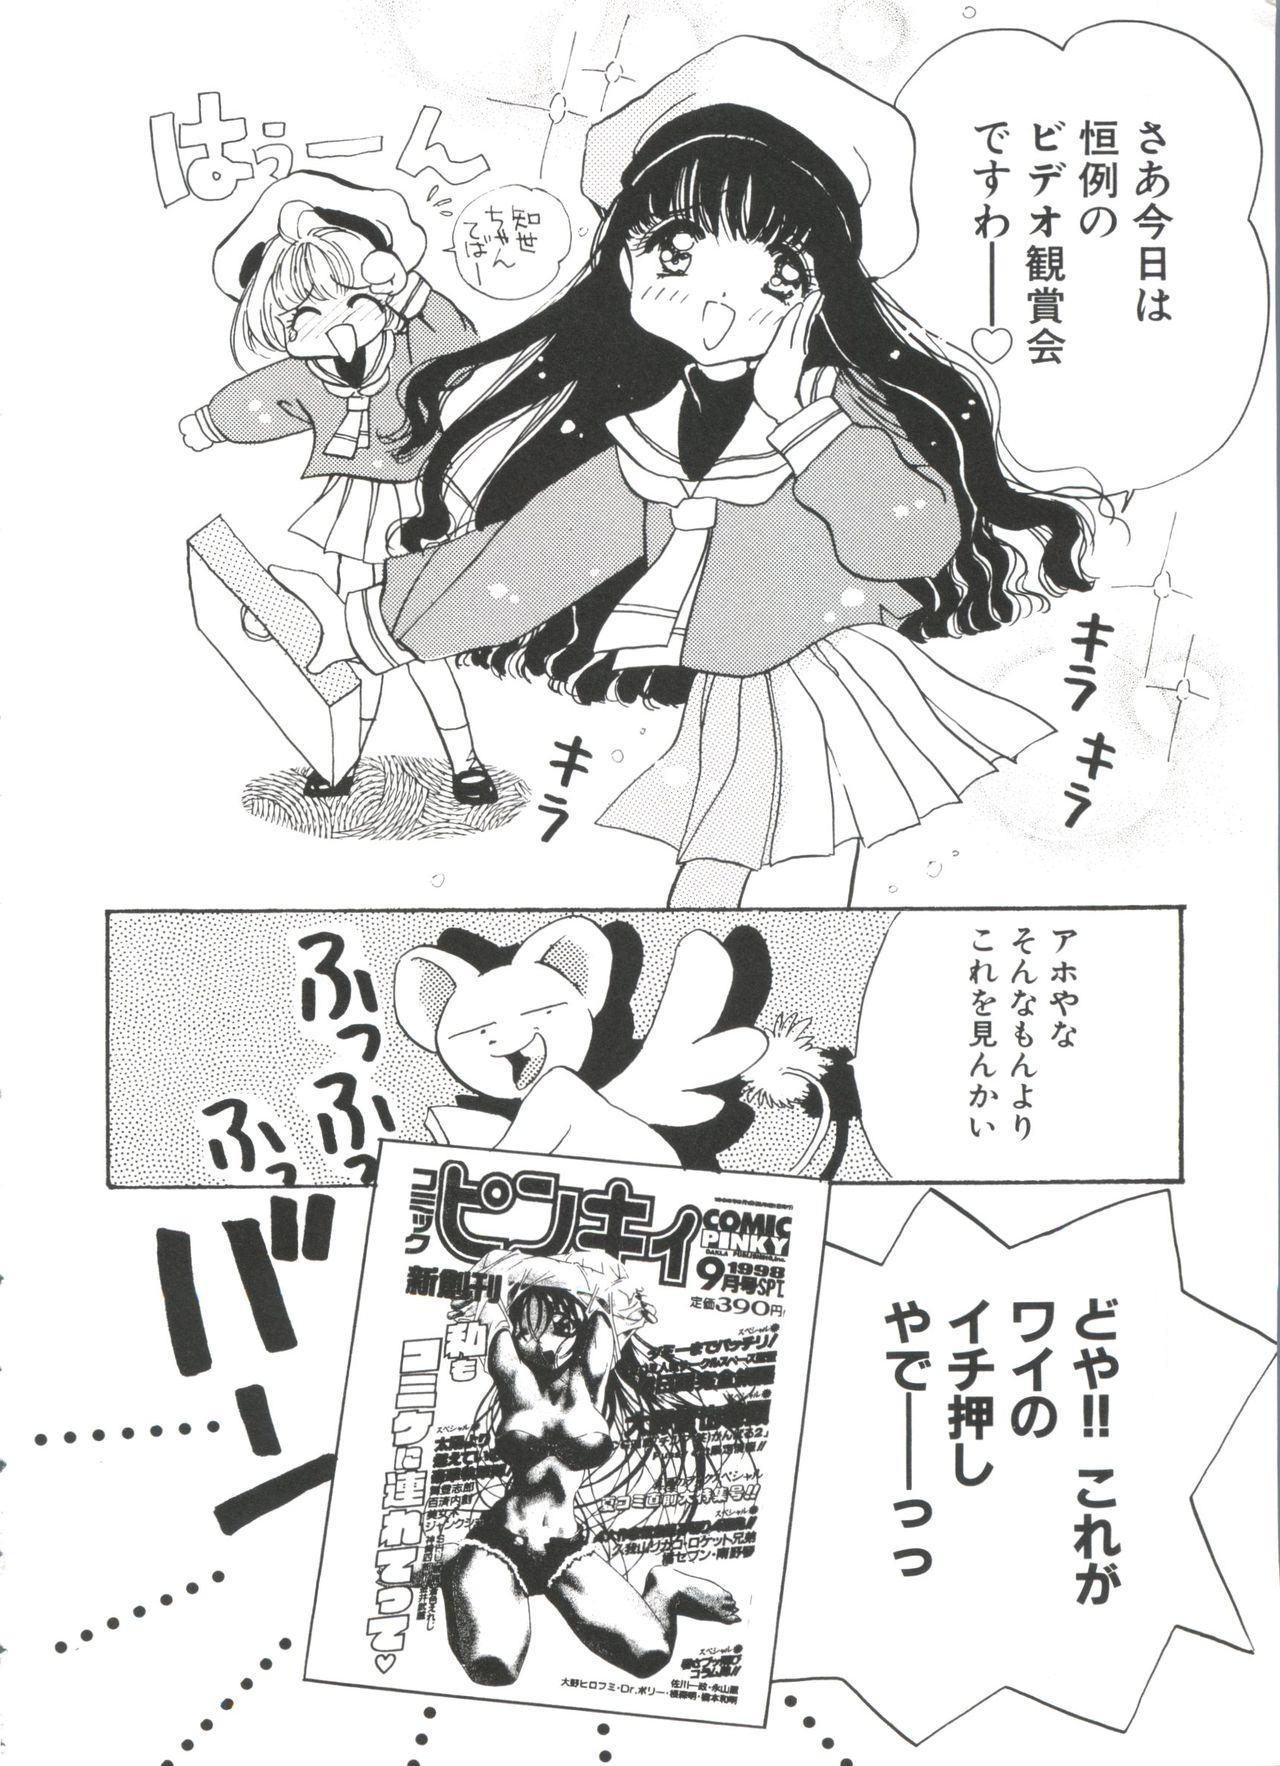 Ero-chan to Issho 2 159